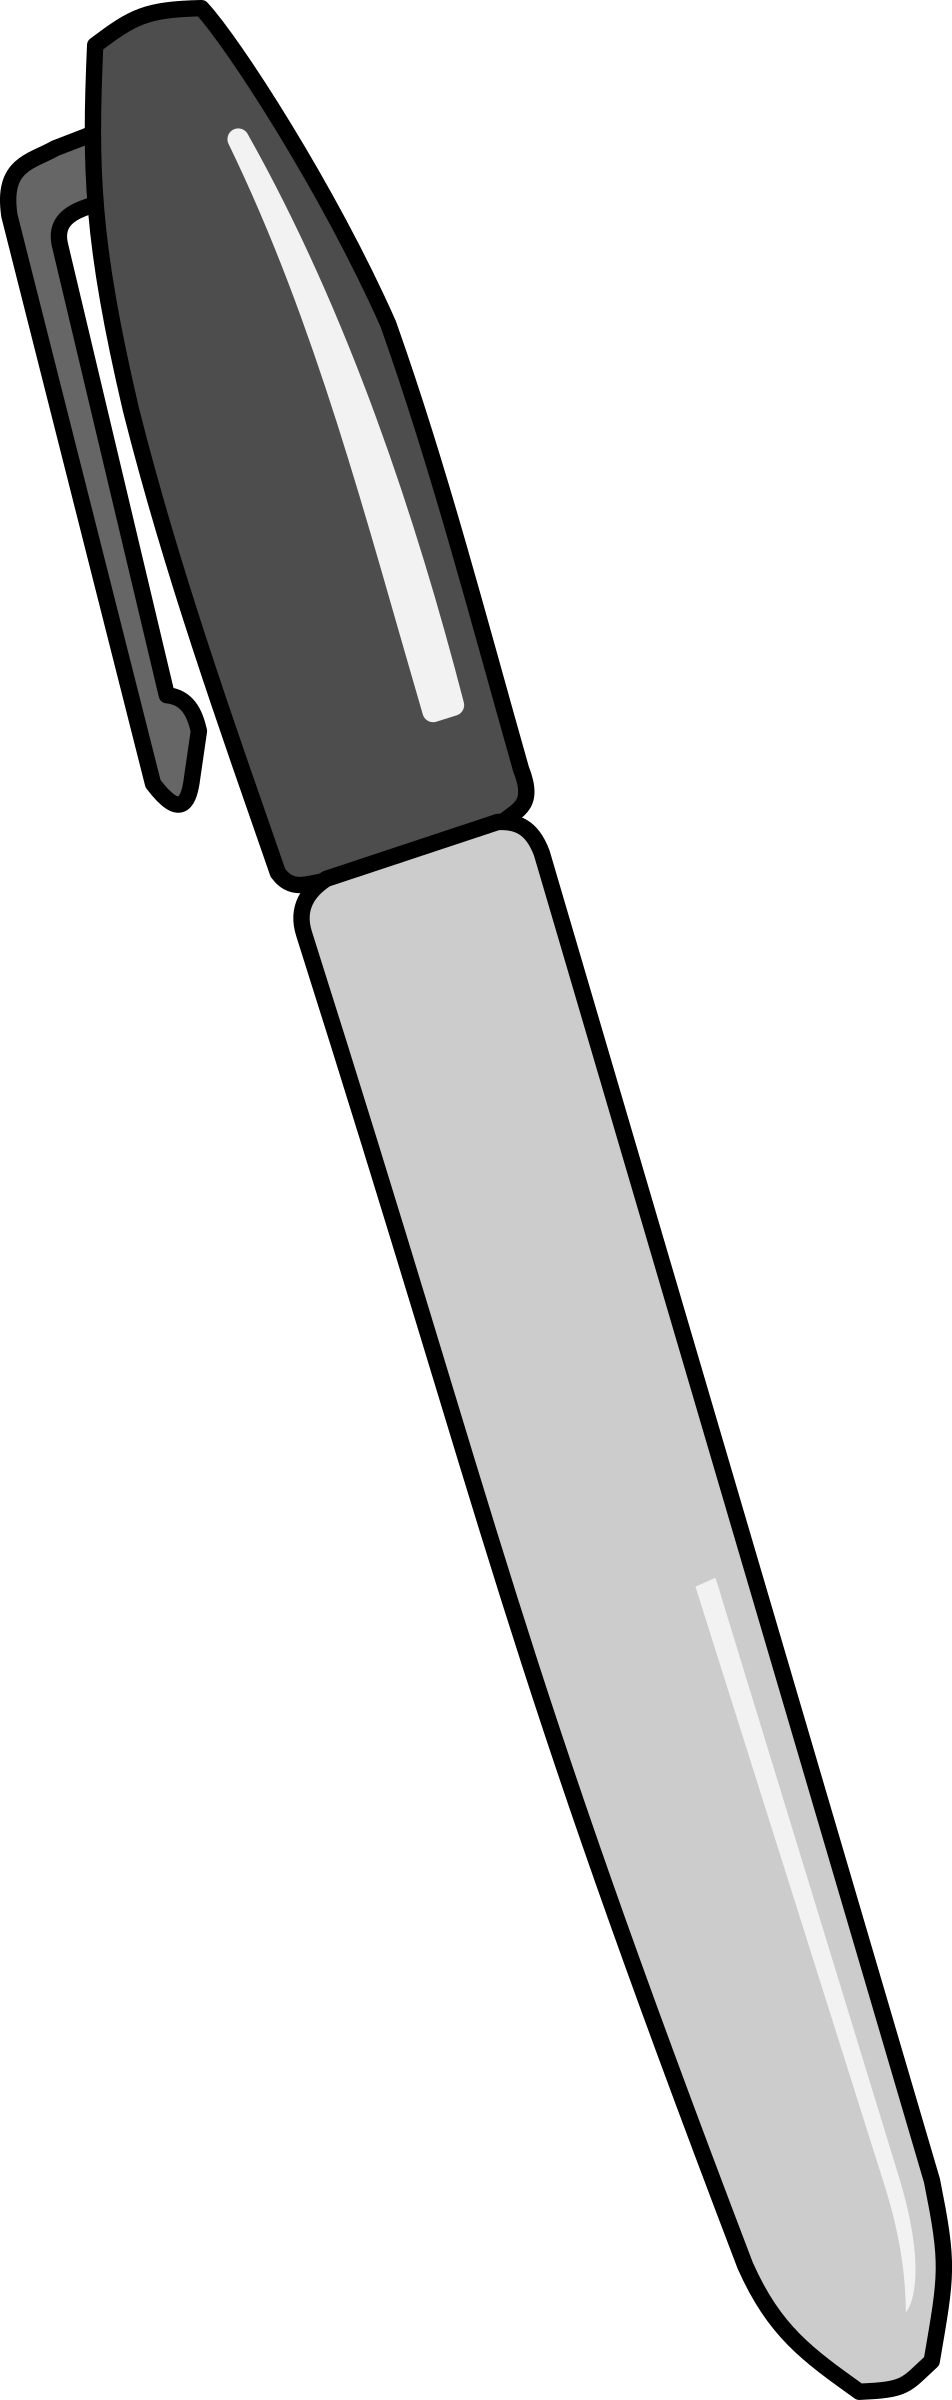 Marker clipart Clipart Permanent Permanent marker marker